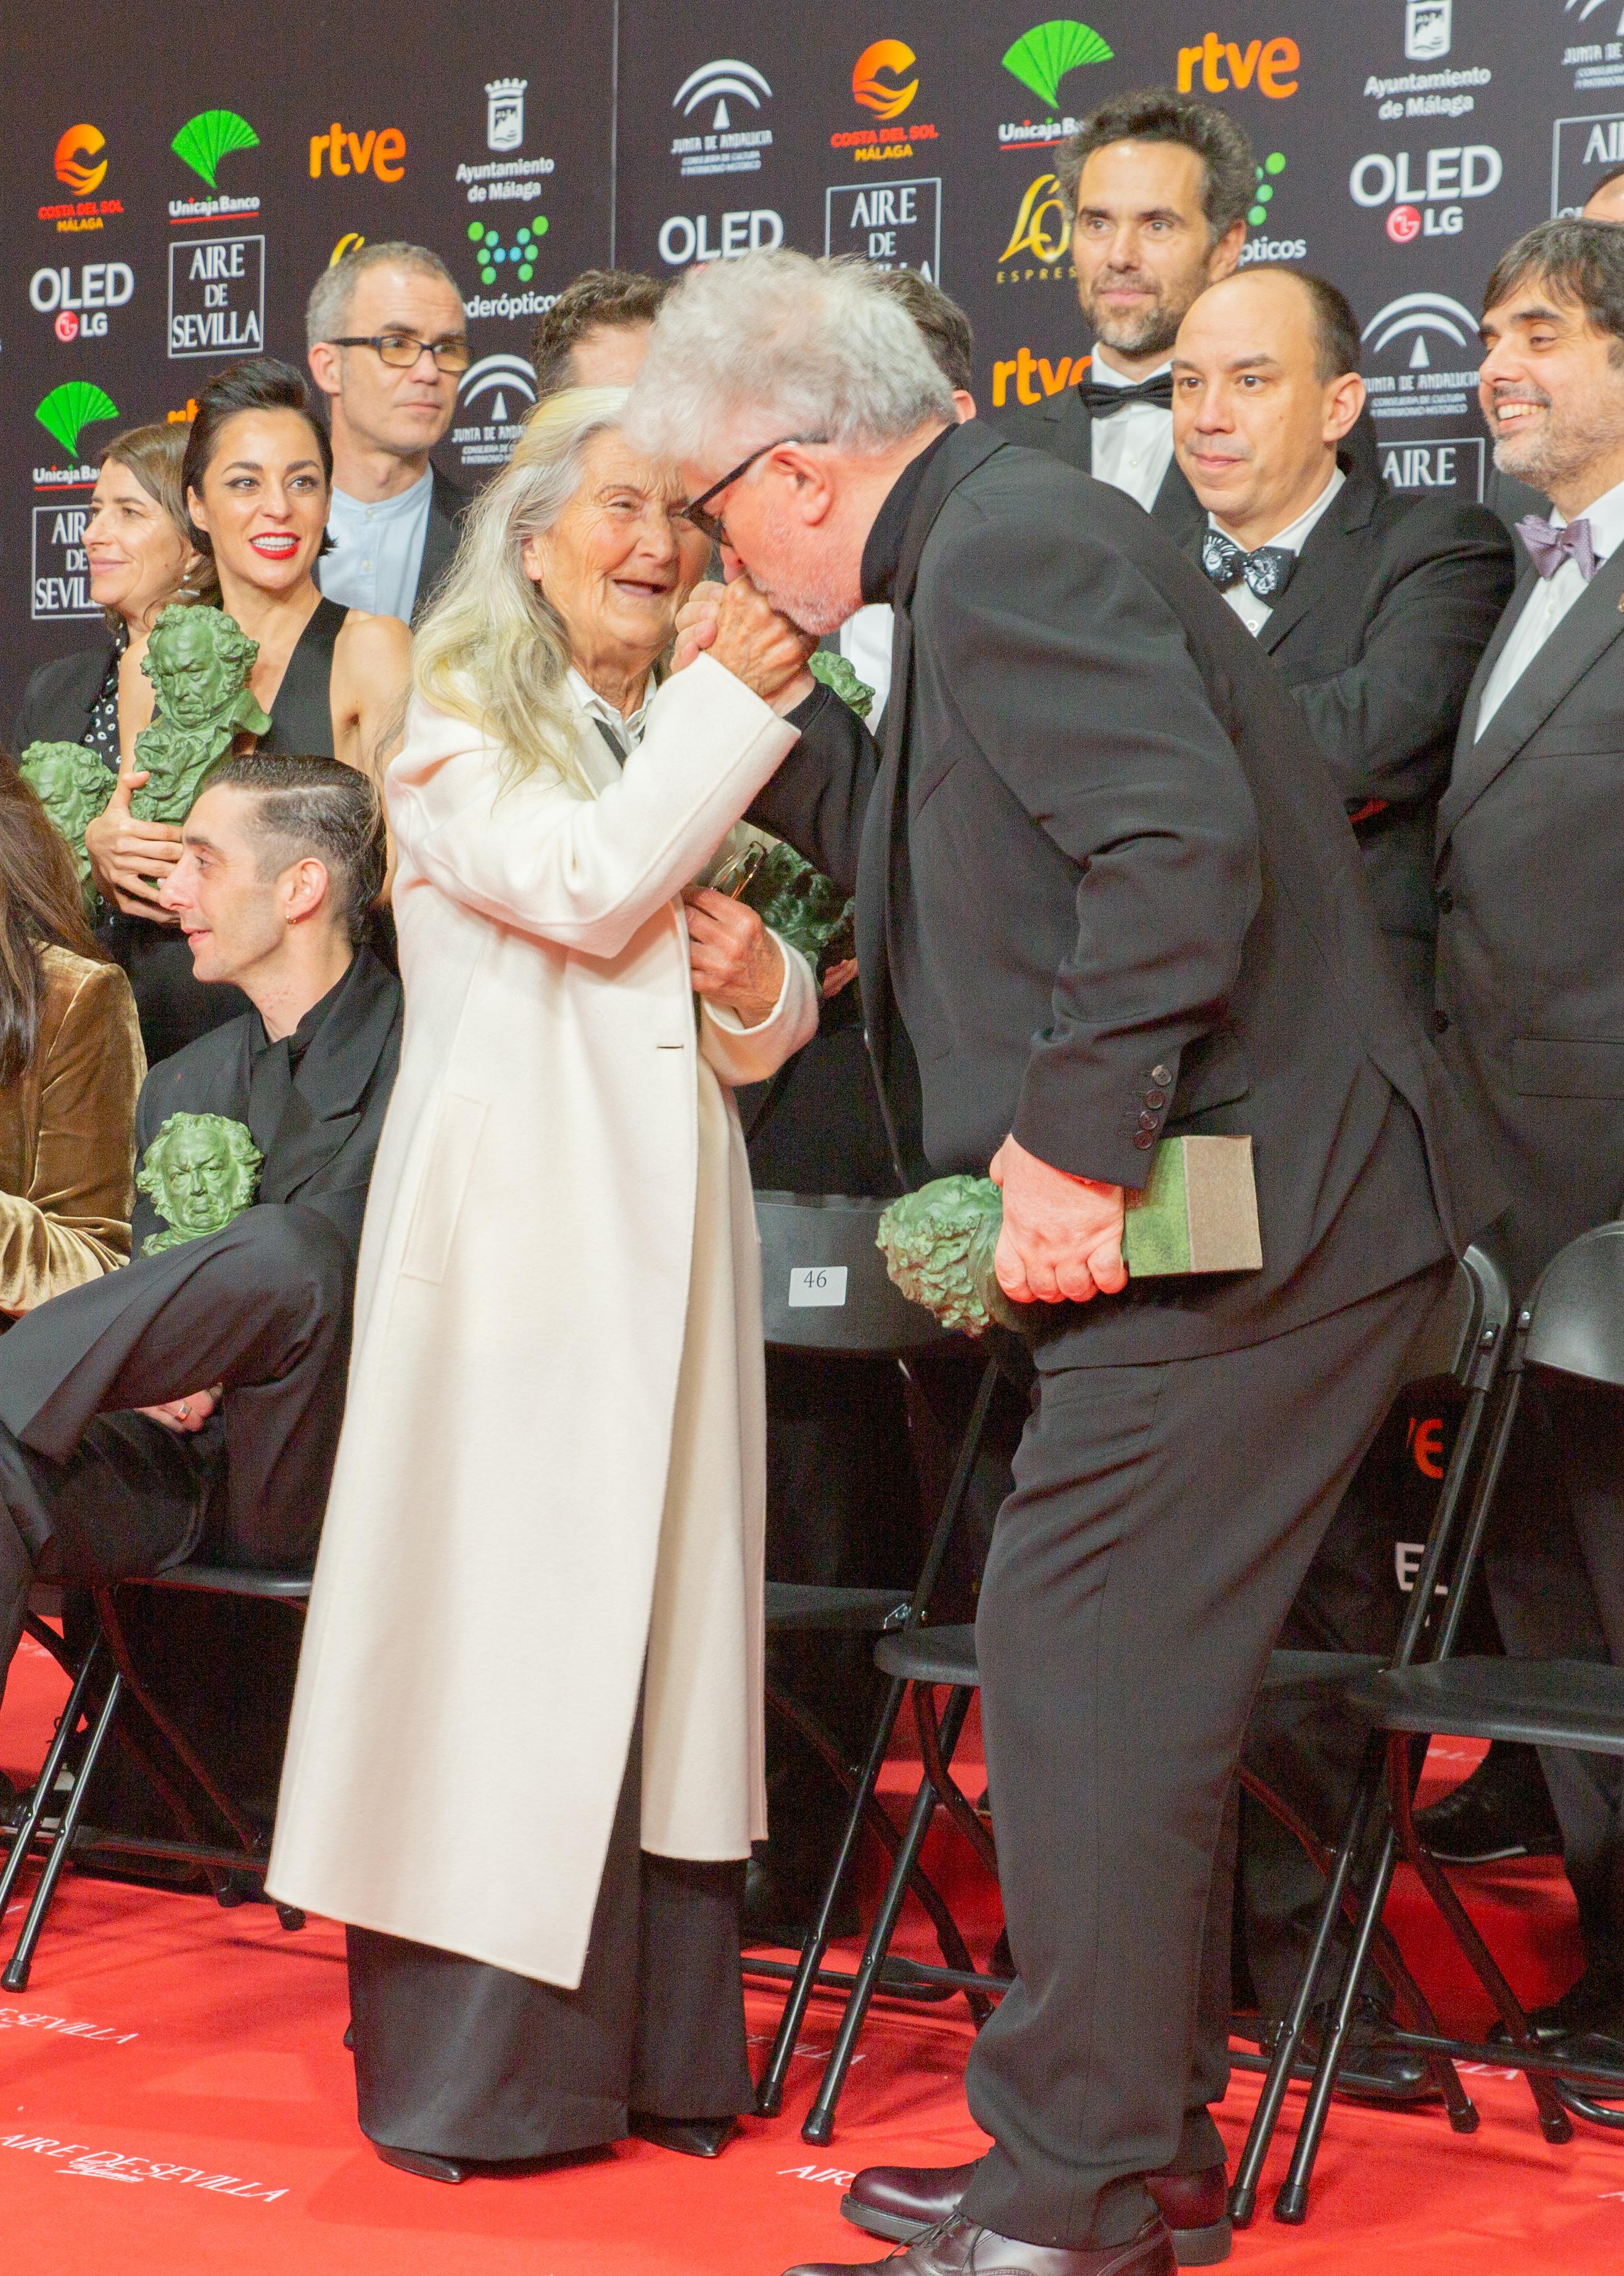 File:Premios Goya 2020 - Benedicta Sanchez y Almodovar.jpg - Wikimedia Commons